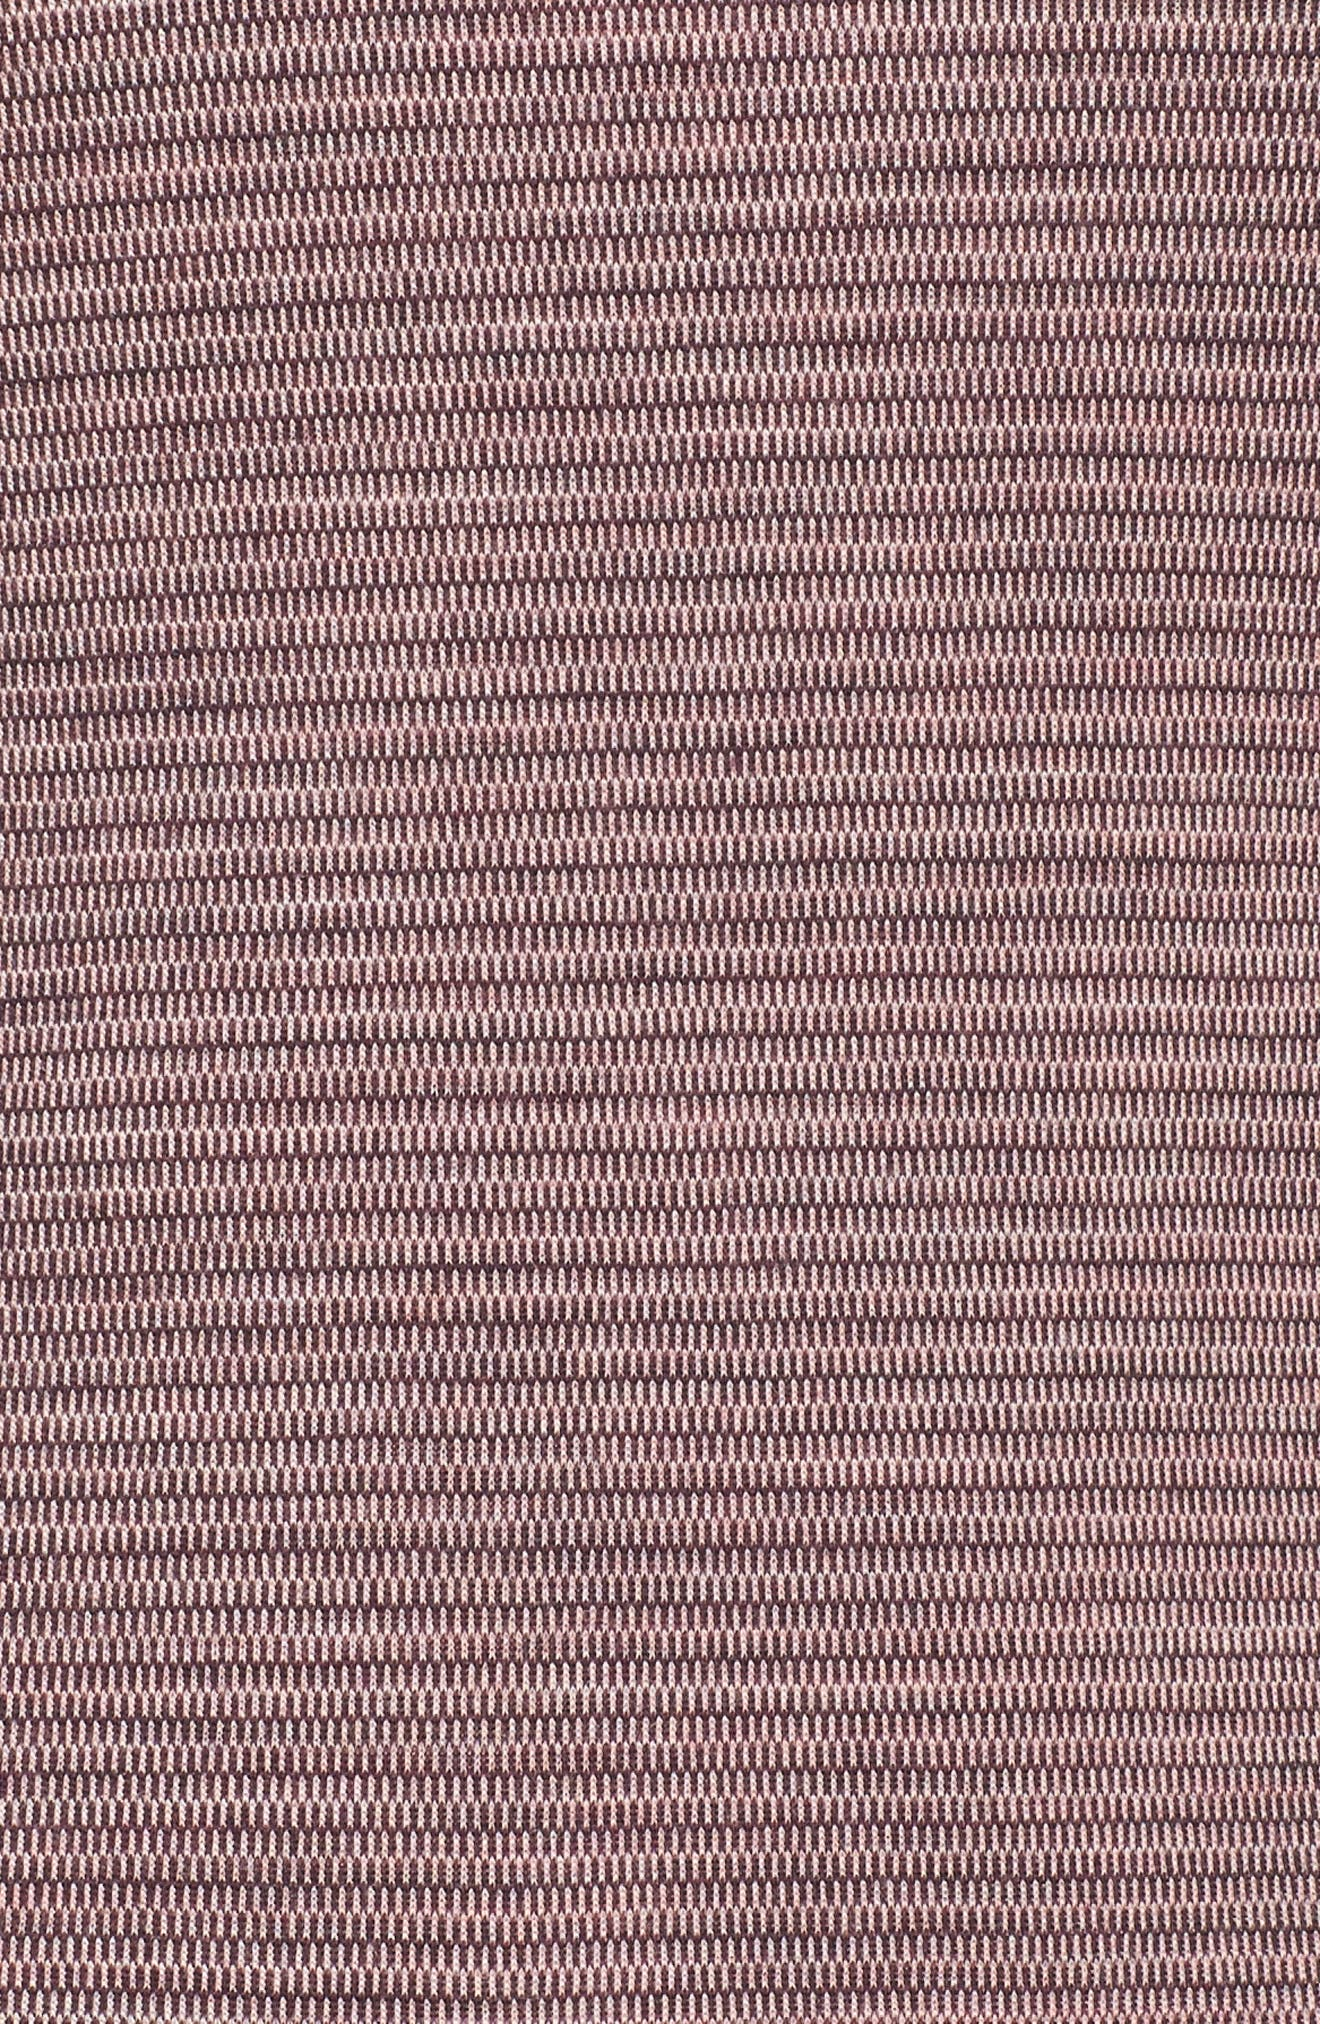 Merino Wool 250 Base Layer Top,                             Alternate thumbnail 6, color,                             Bordeaux